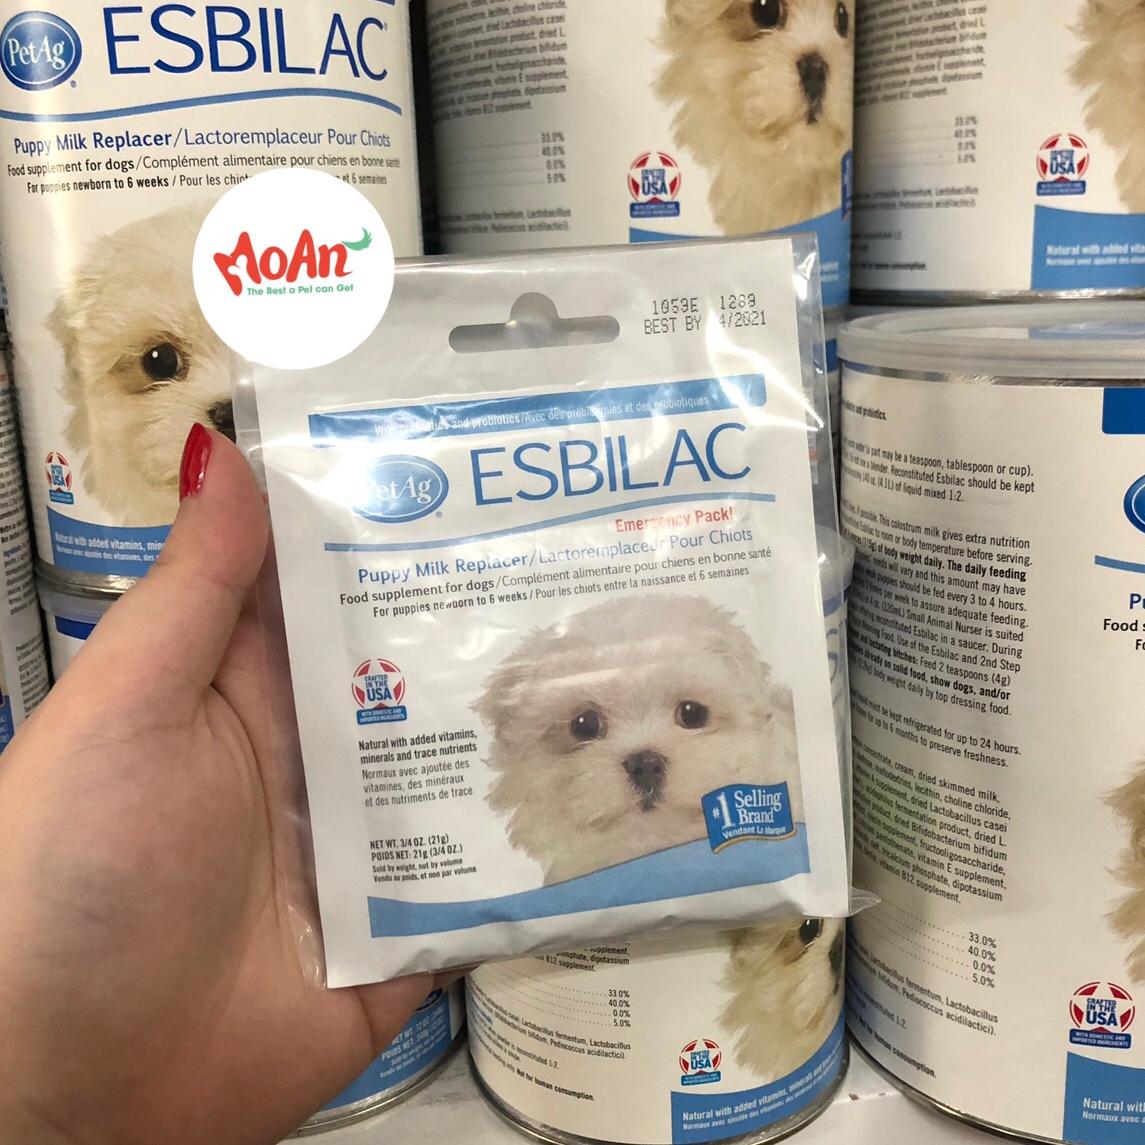 Sữa PetAg ESBILAC Mỹ dạng bột 21g